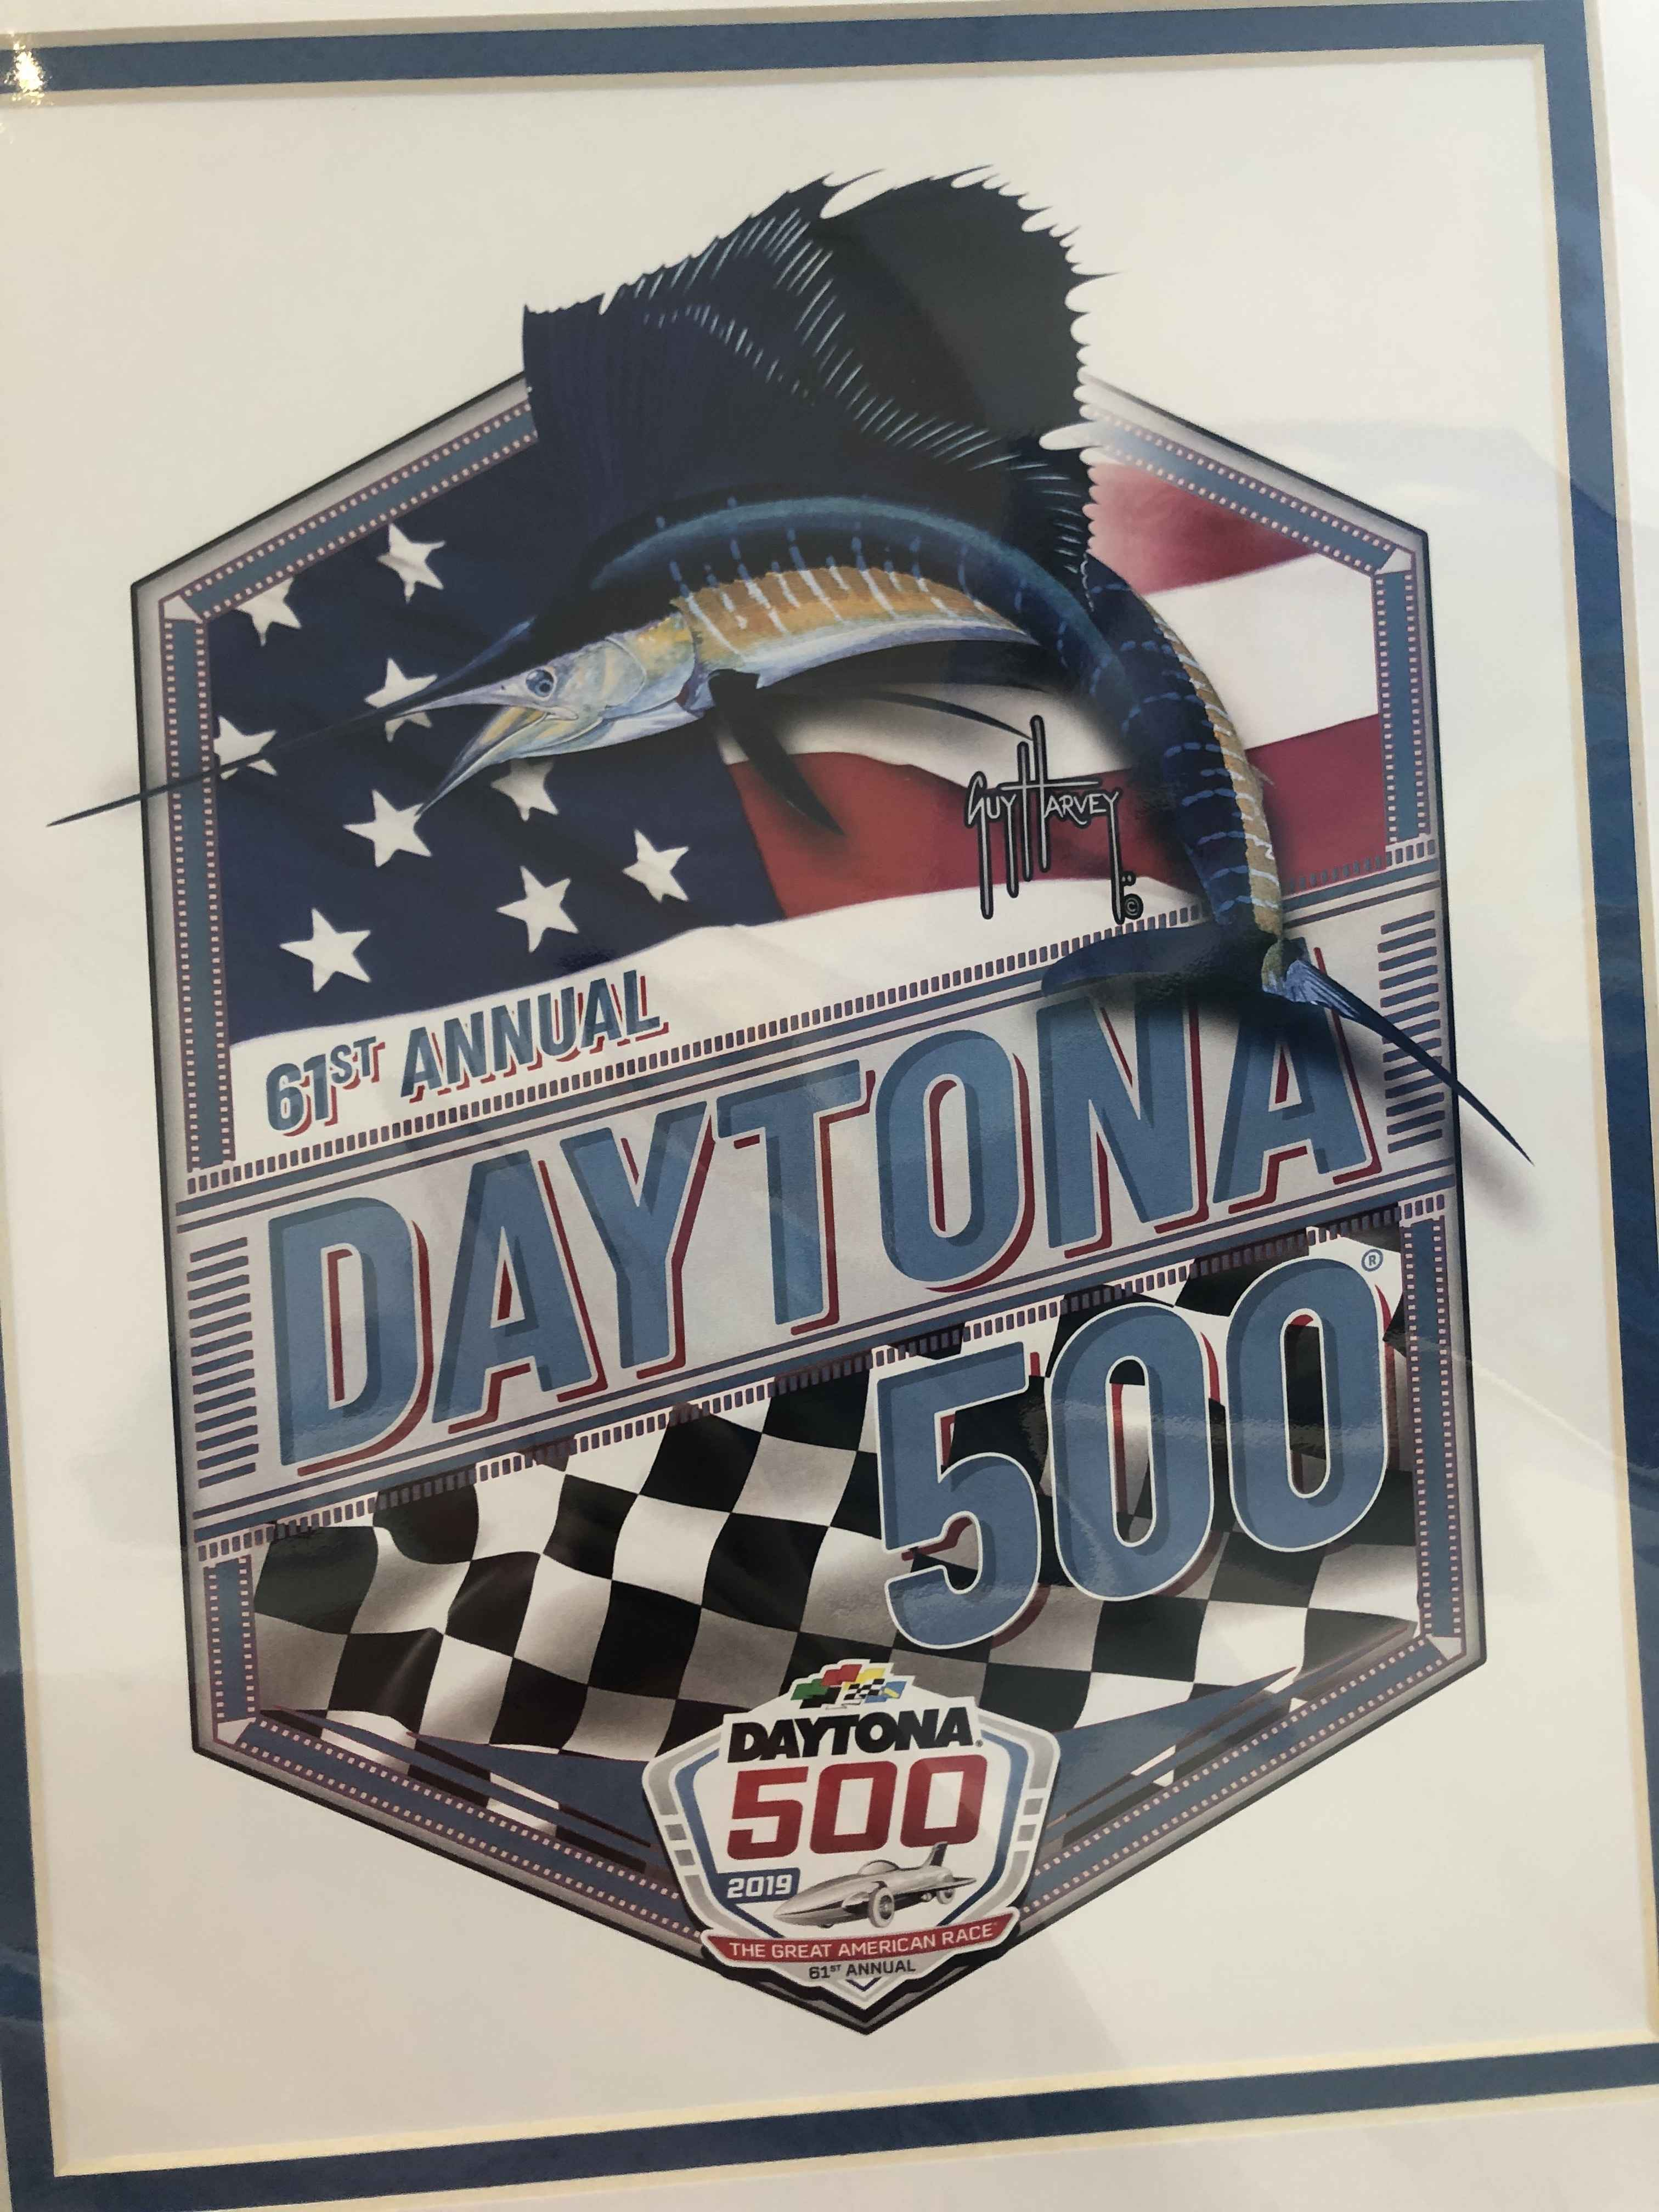 2019 Daytona 500 Print by  Guy Harvey - Masterpiece Online